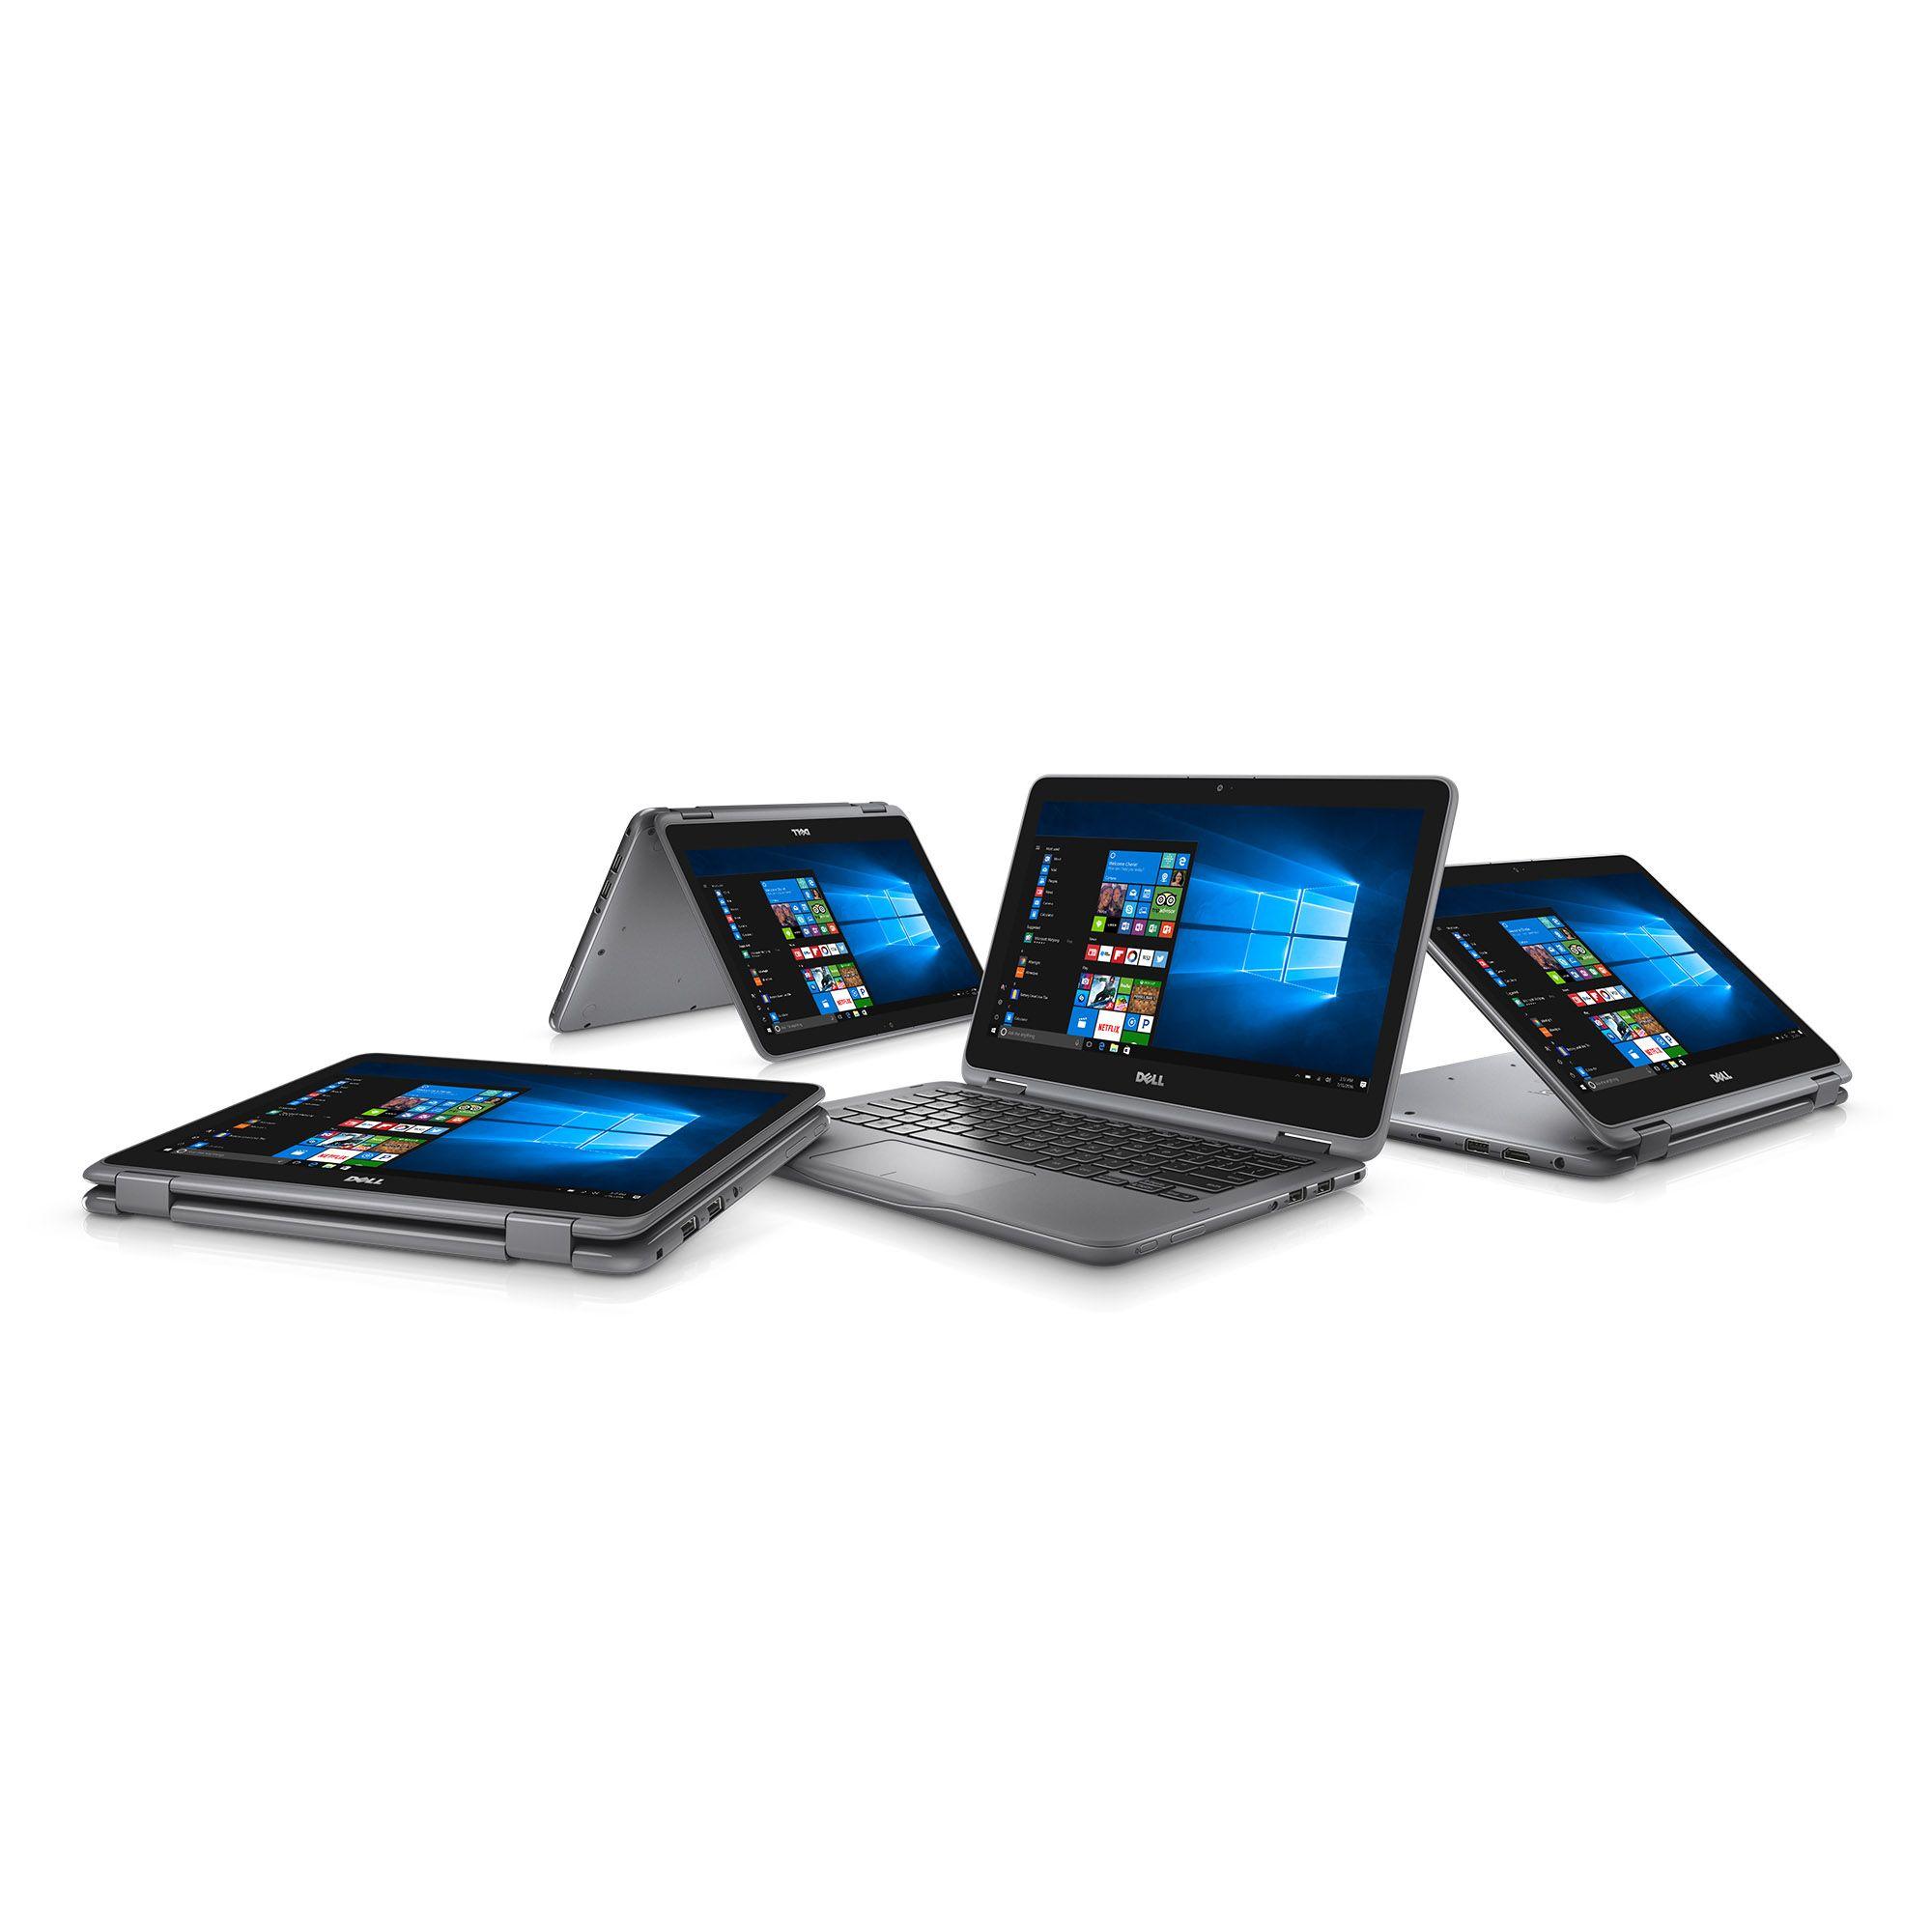 Dell Inspiron 11 Laptop, 11 6